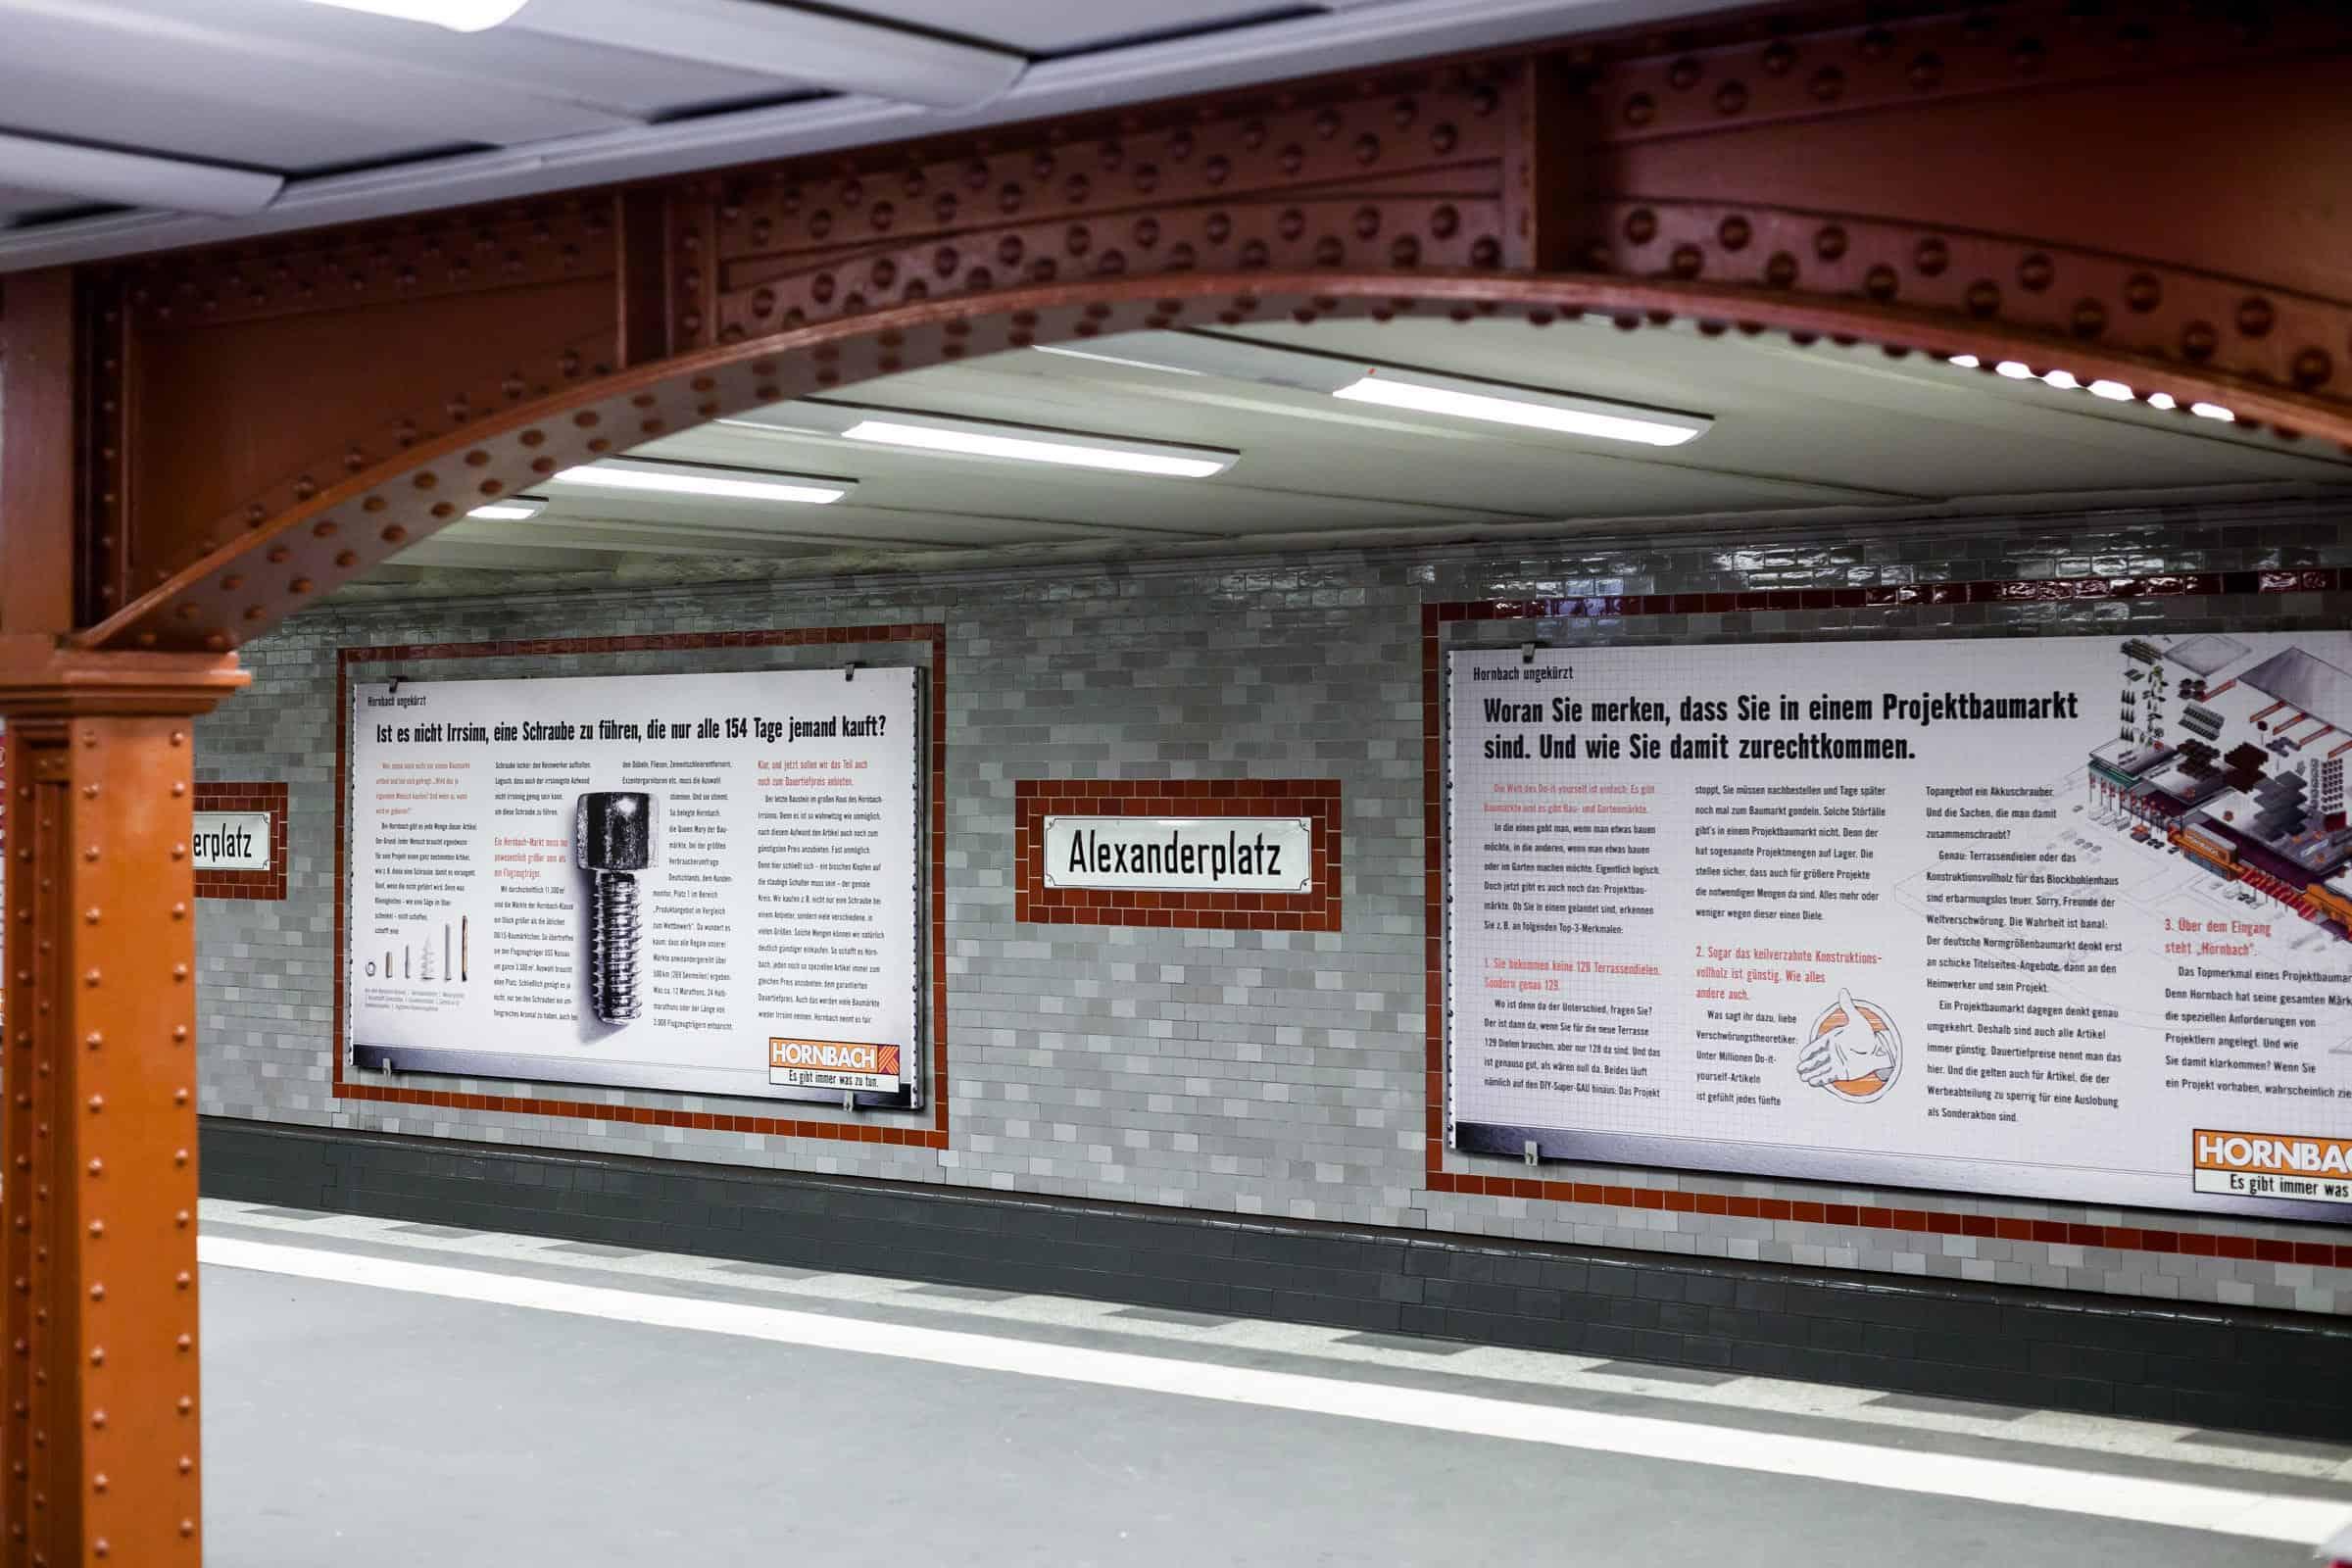 S2 - U Bahnhof Alexanderplatz – Berlin Gleise